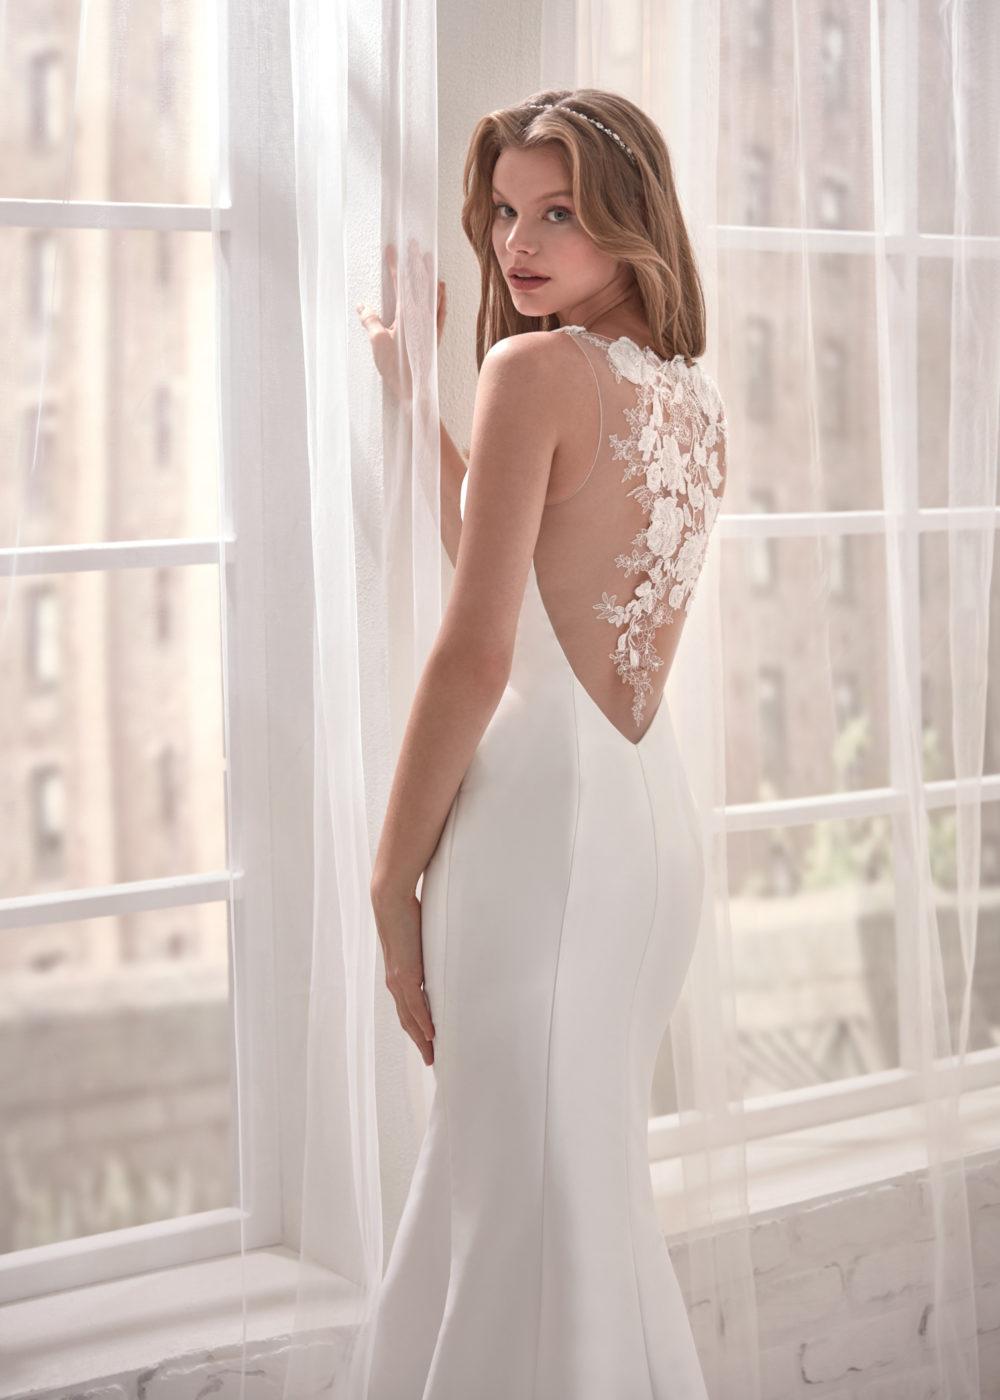 Mariages: abito da sposa Morilee 2020 a Vicenza, Verona, Padova, Veneto JOA20551